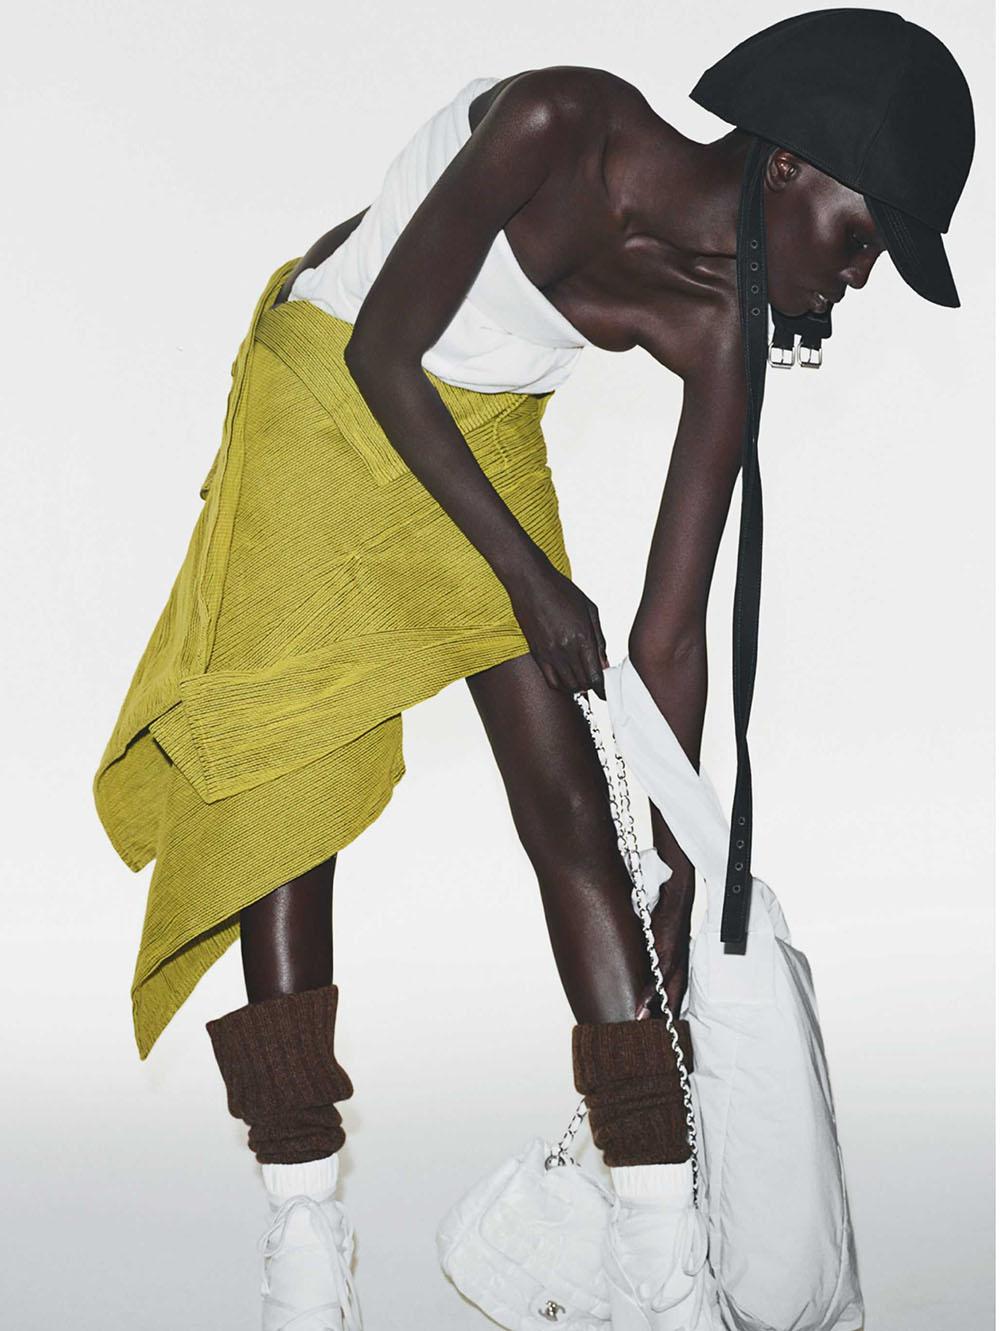 Sarah Berger and Shanelle Nyasiase by Tim Elkaïm for Vogue Italia October 2019